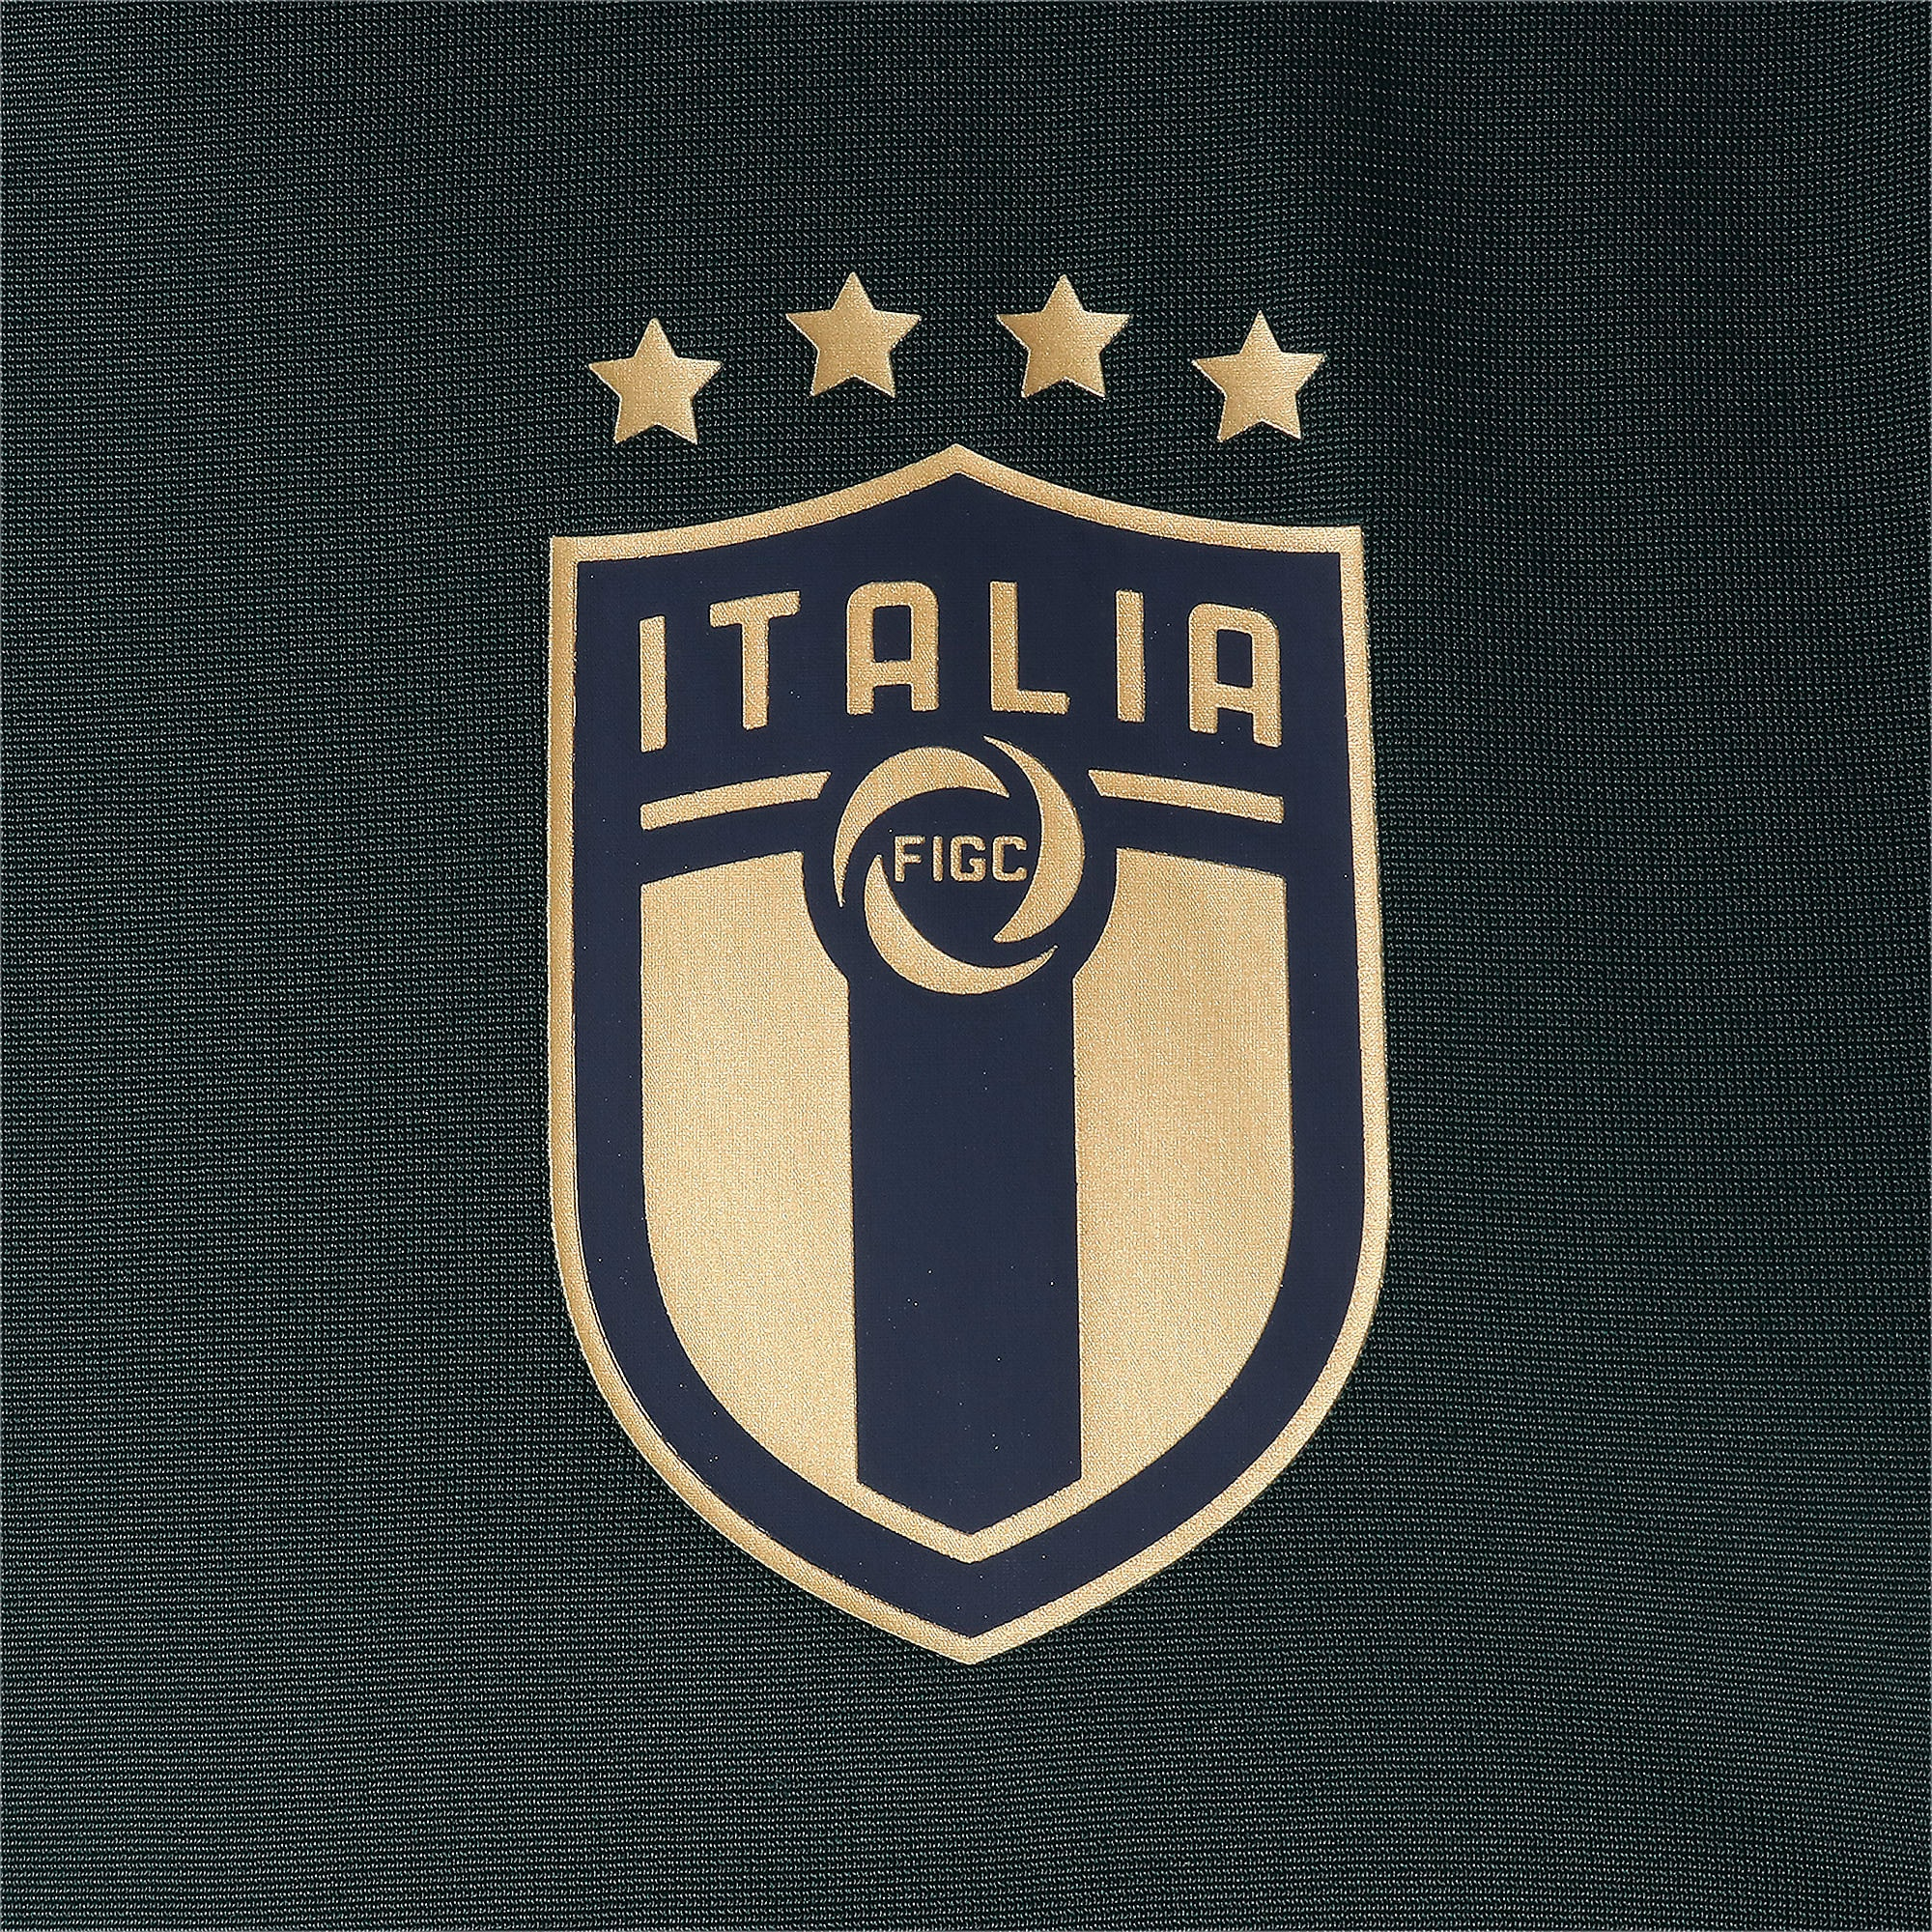 Thumbnail 8 of FIGC イタリア RENAISSANCE スタジアム ジャケット, Ponderosa Pine-Cordovan, medium-JPN